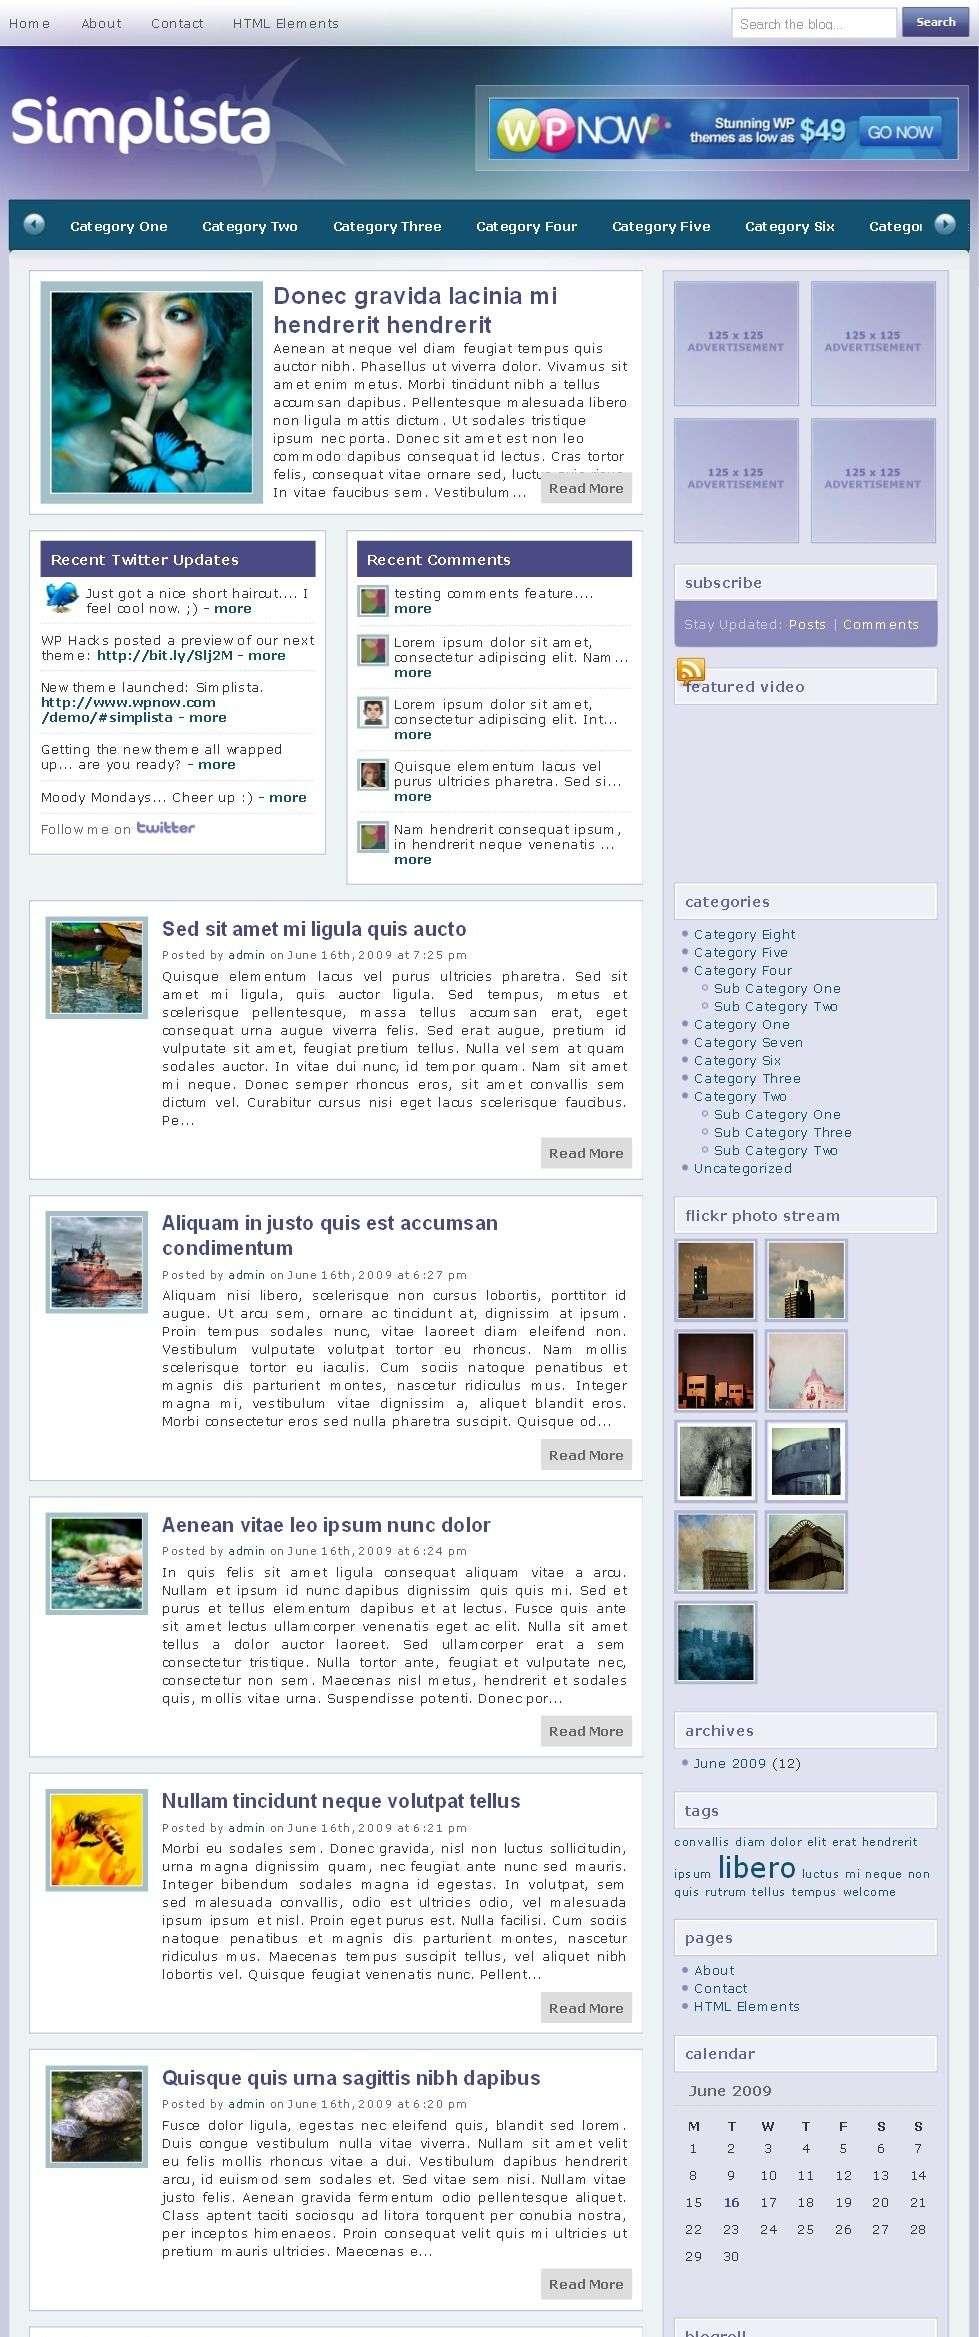 simplista avjthemescom wpnow - Simplista Wordpress Theme